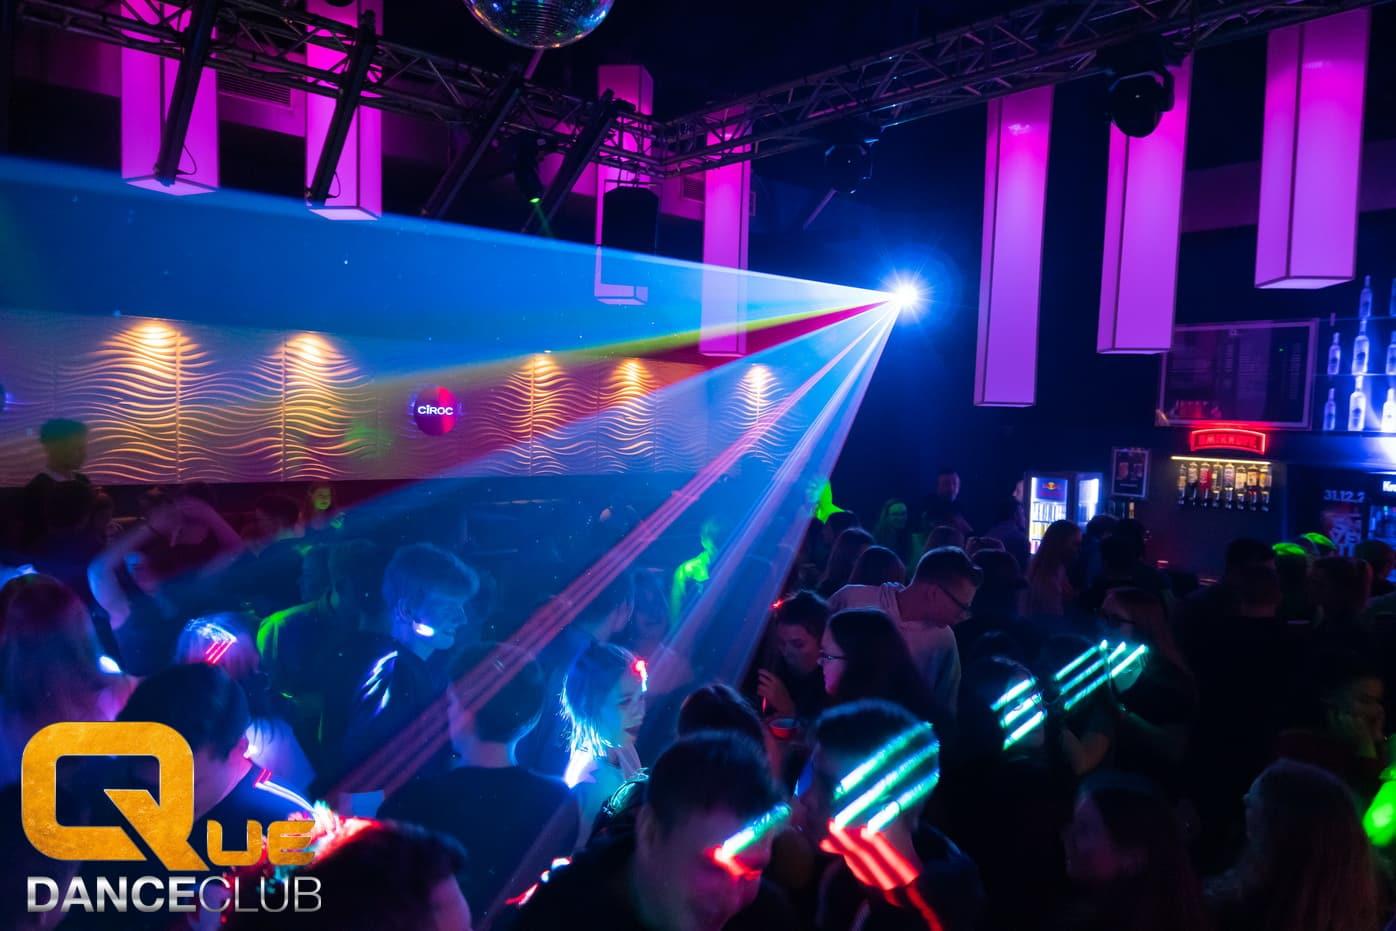 2018_12_20_Que_Danceclub_XMAS_Abiparty_United_Nightlife_Scene_Timo_027